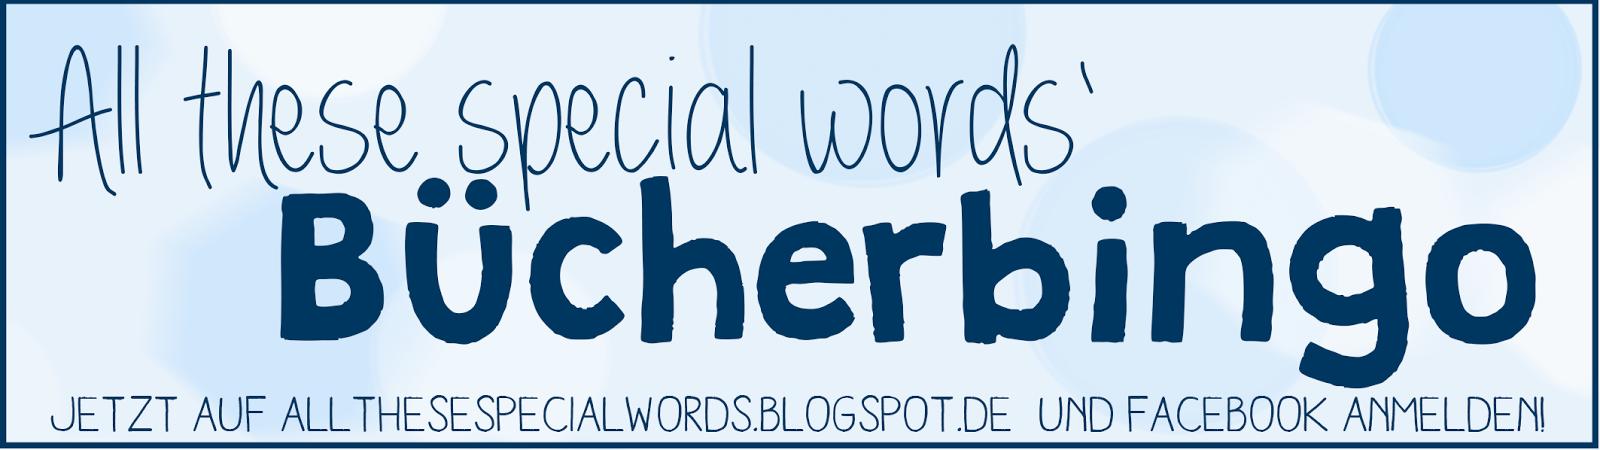 http://allthesespecialwords.blogspot.de/p/bucherbingo-2015.html